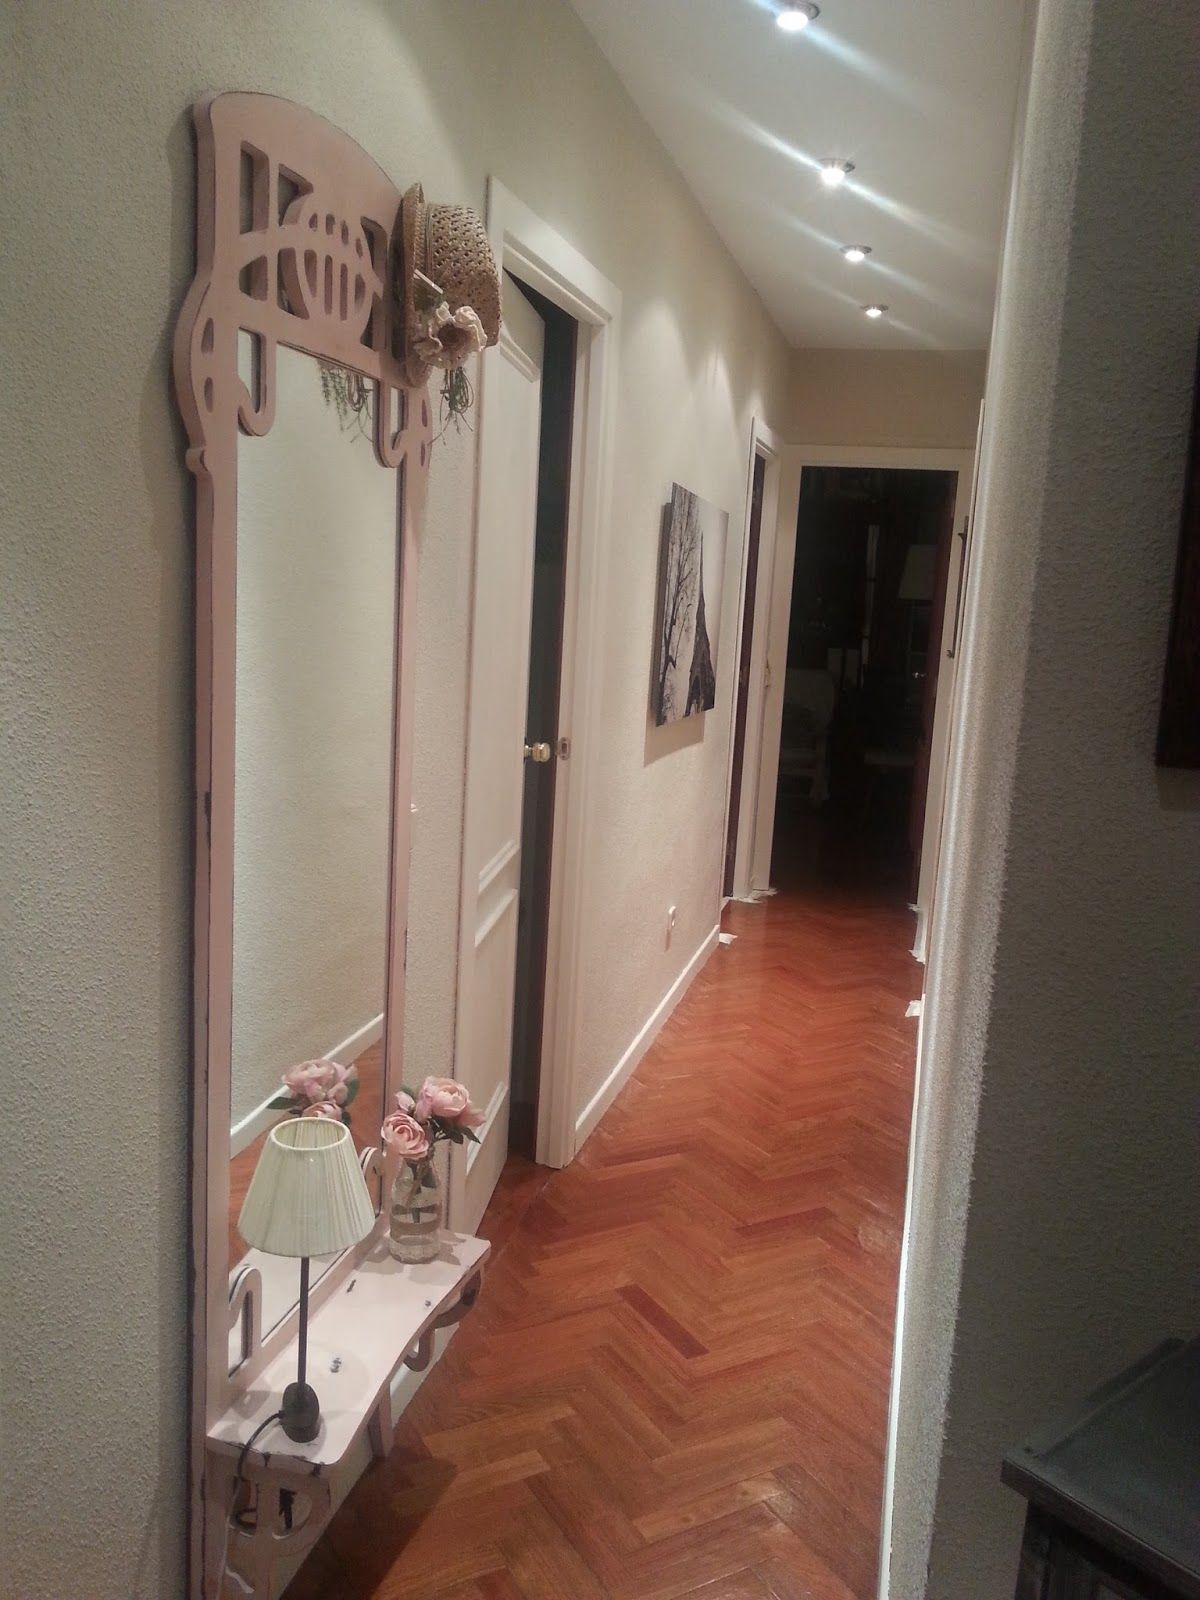 Pintar puertas de madera best cmo pintar una puerta con for Pintar ventanas de madera exterior